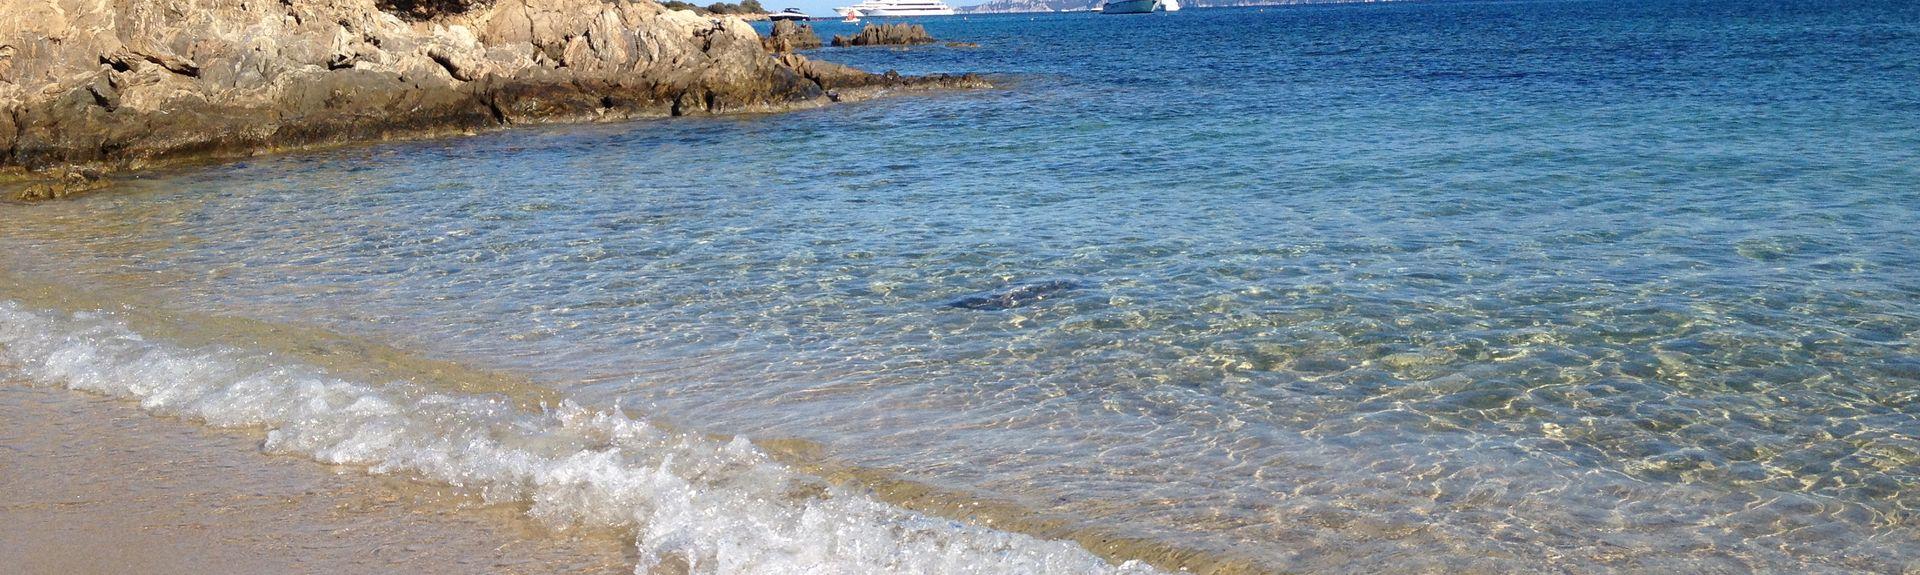 Tergu, Sardinia, Italia